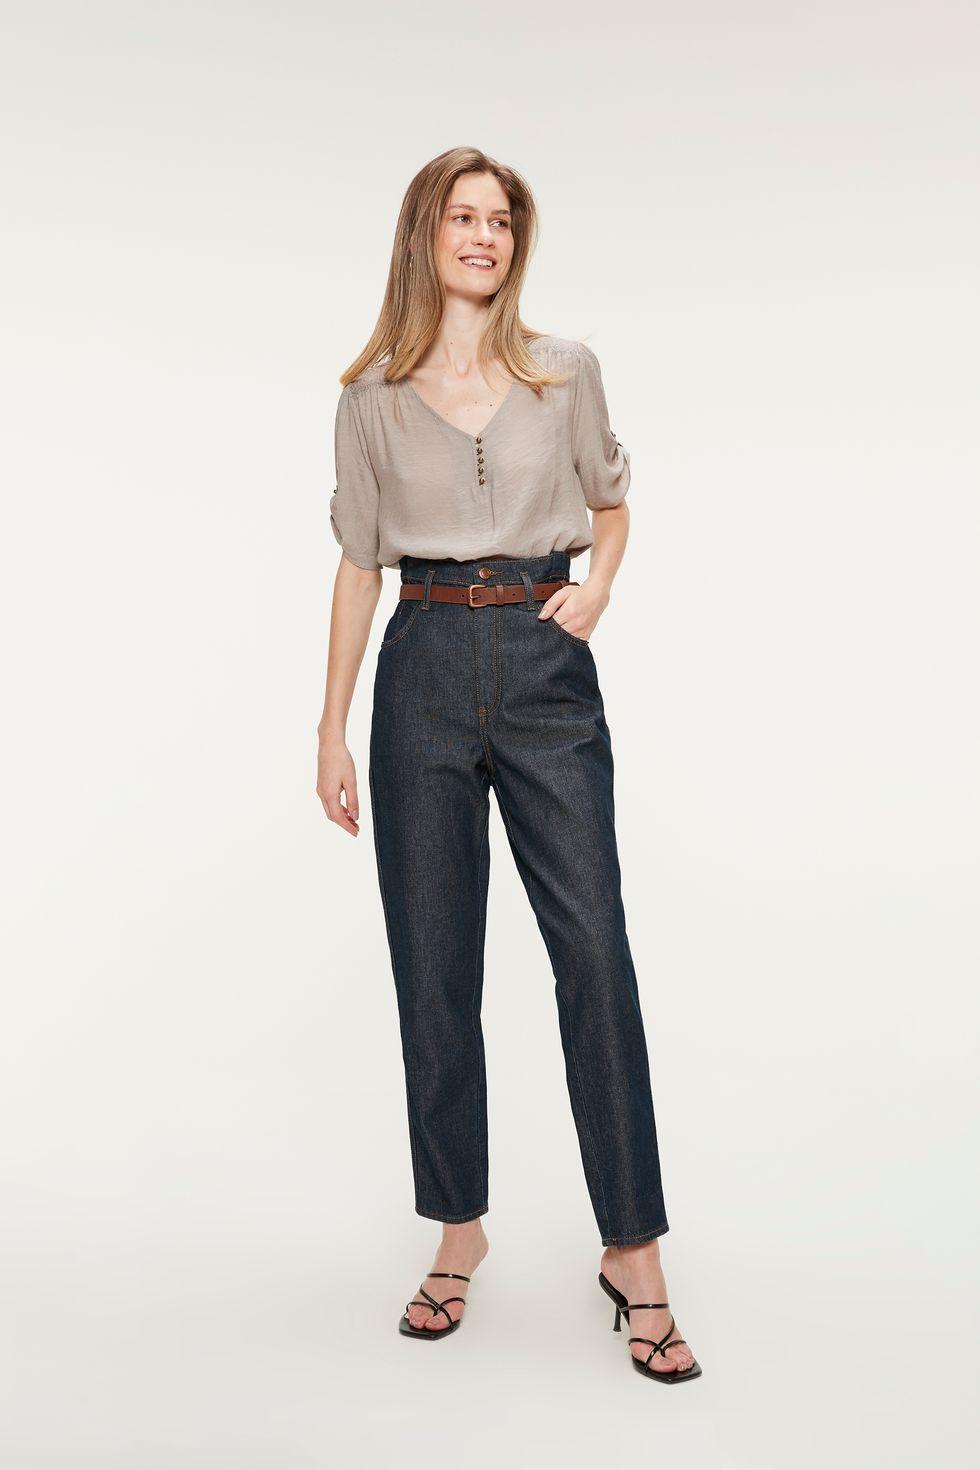 Calça Jeans Escuro Clochard Cropped Tam: 36 / Cor: ESCURA AMACIADA